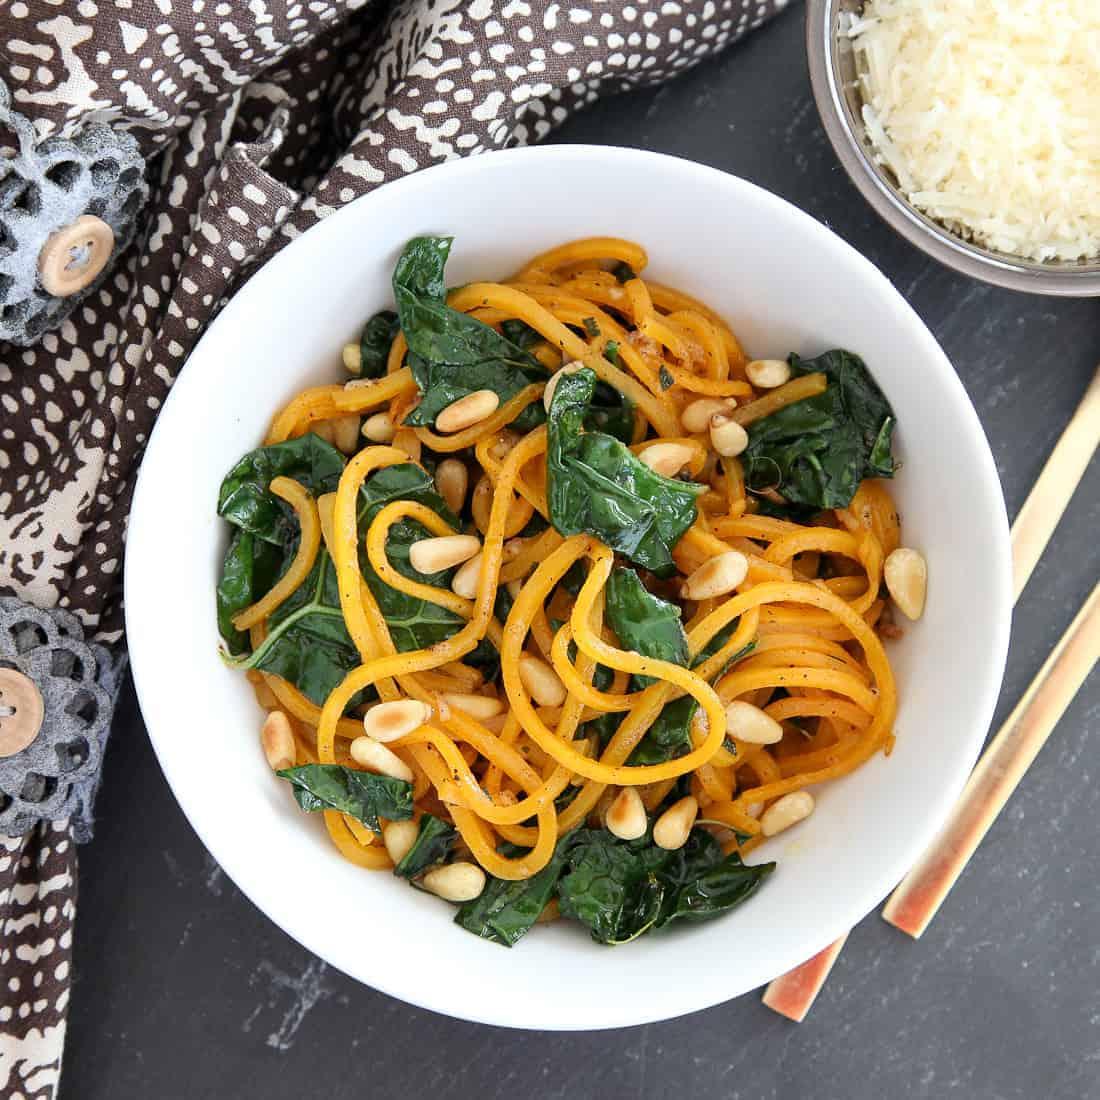 Butternut squash noodles with kale